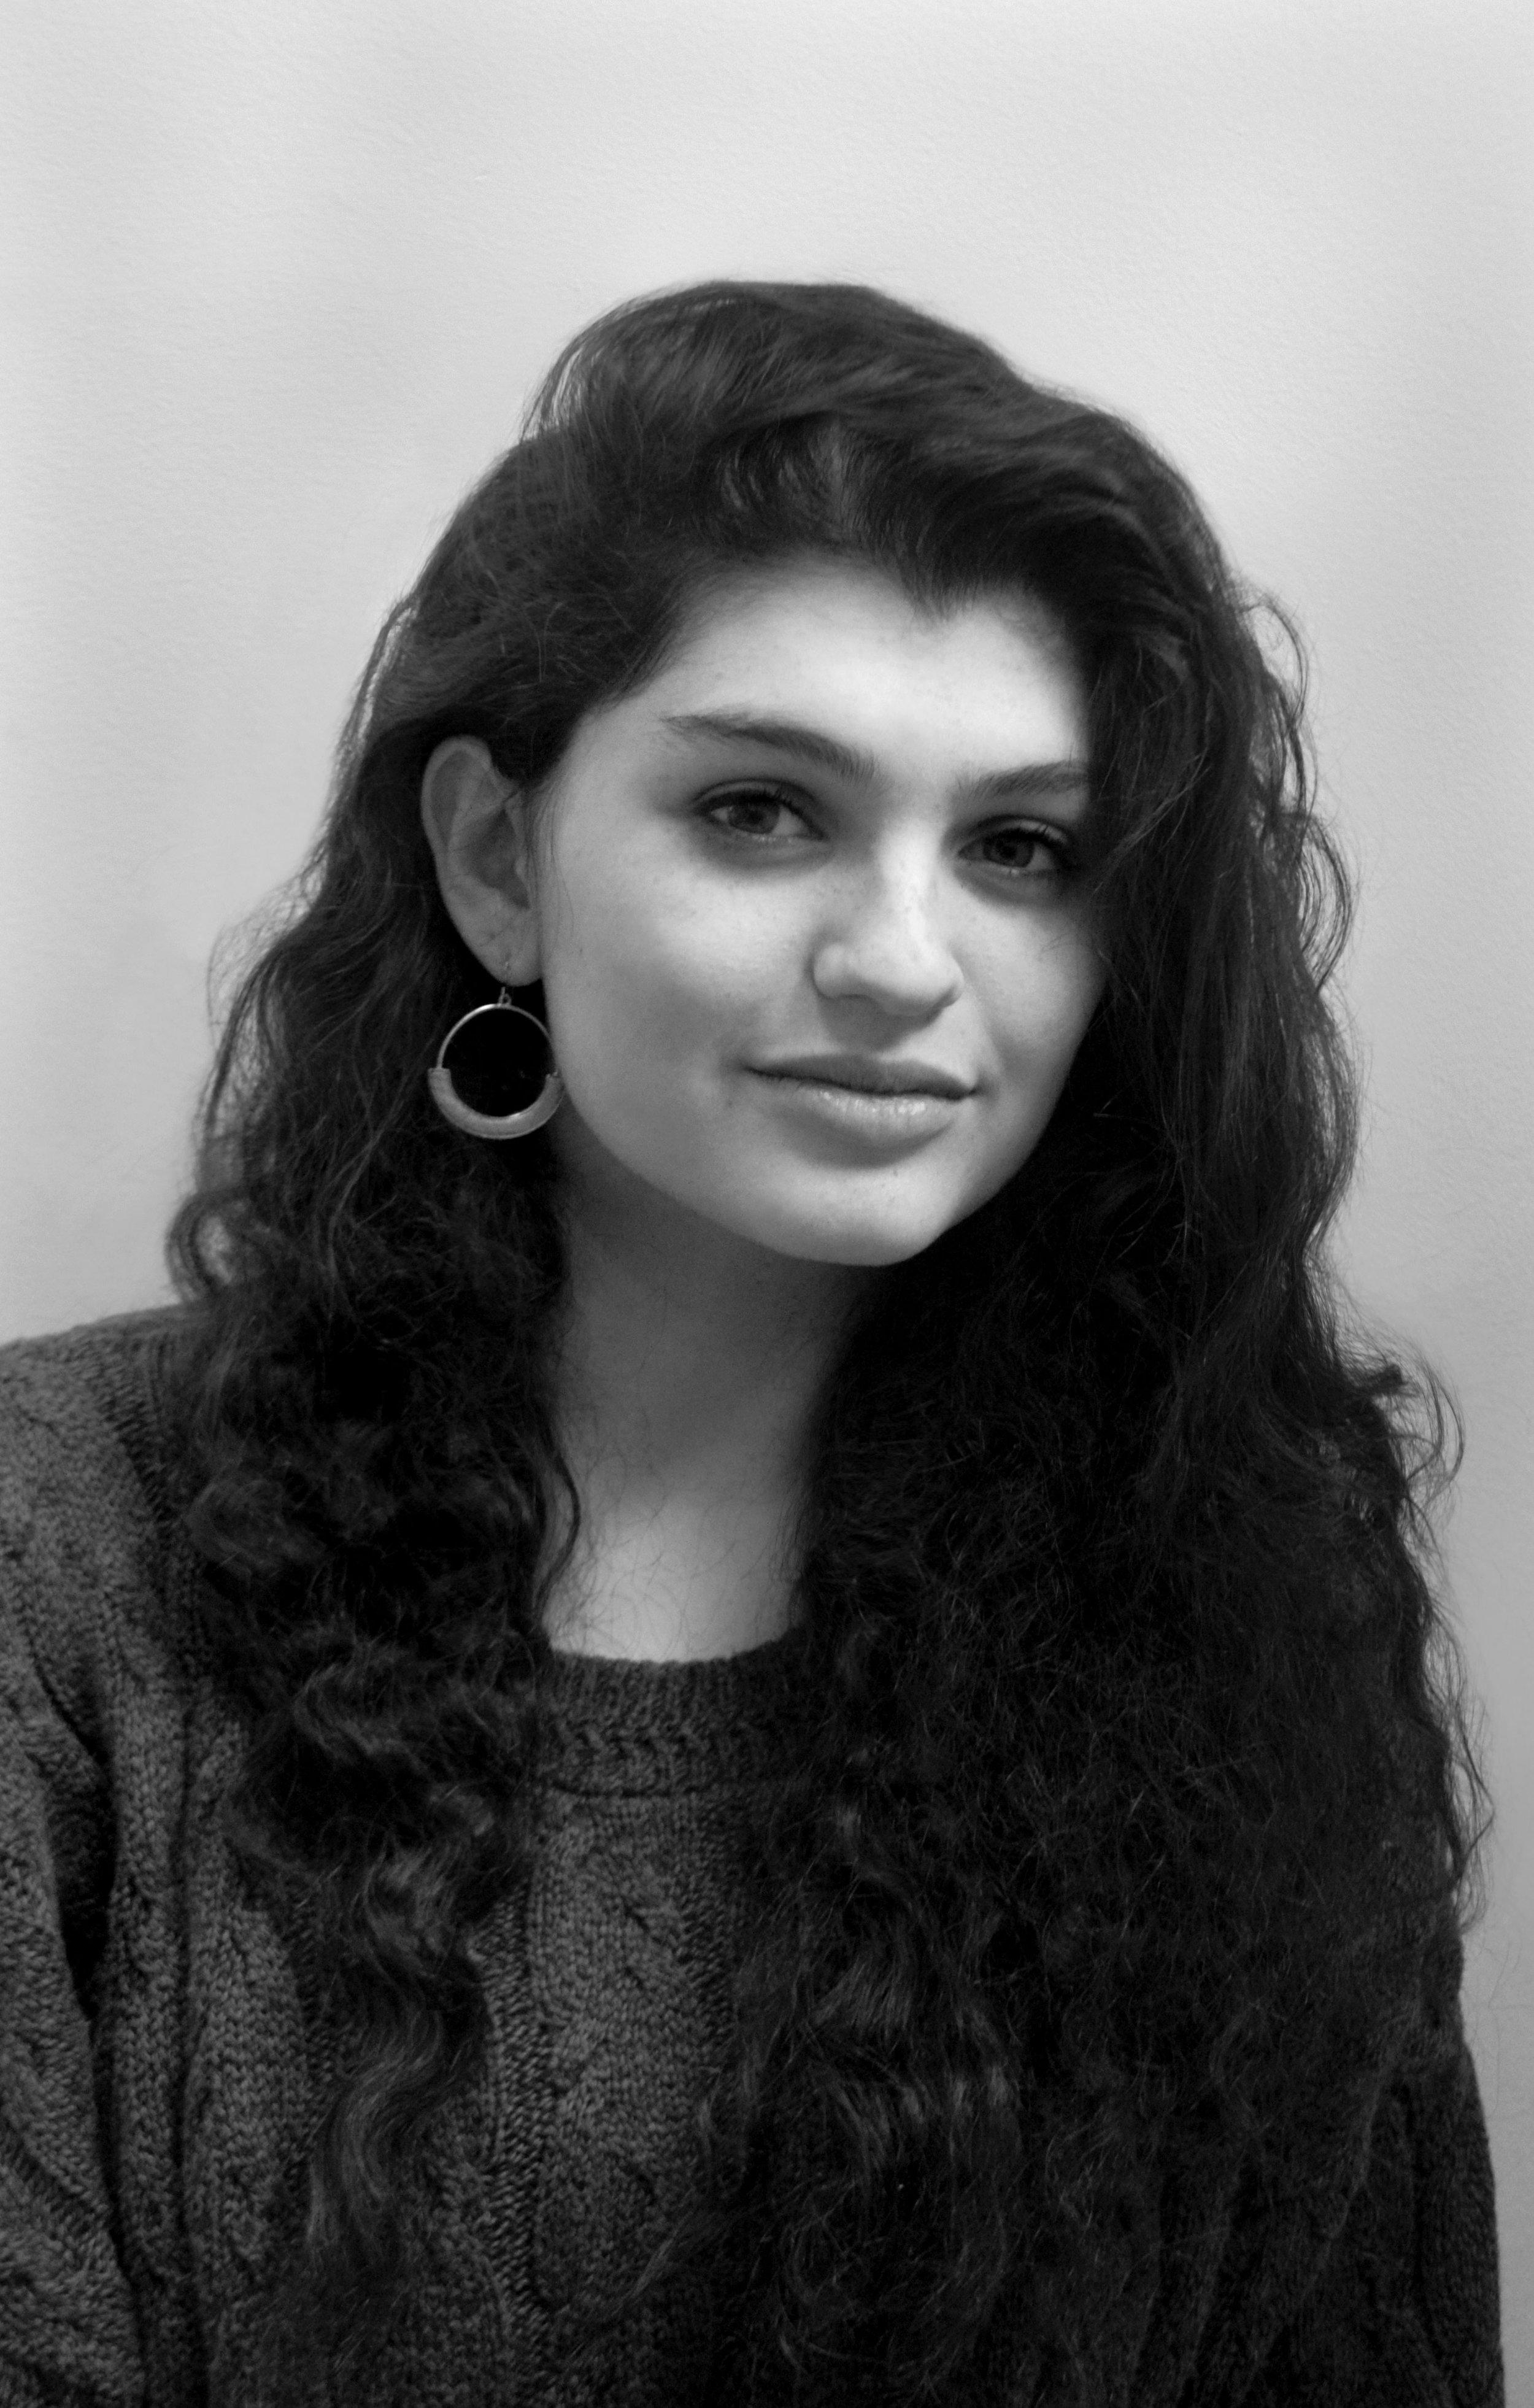 Nicolaia Rips